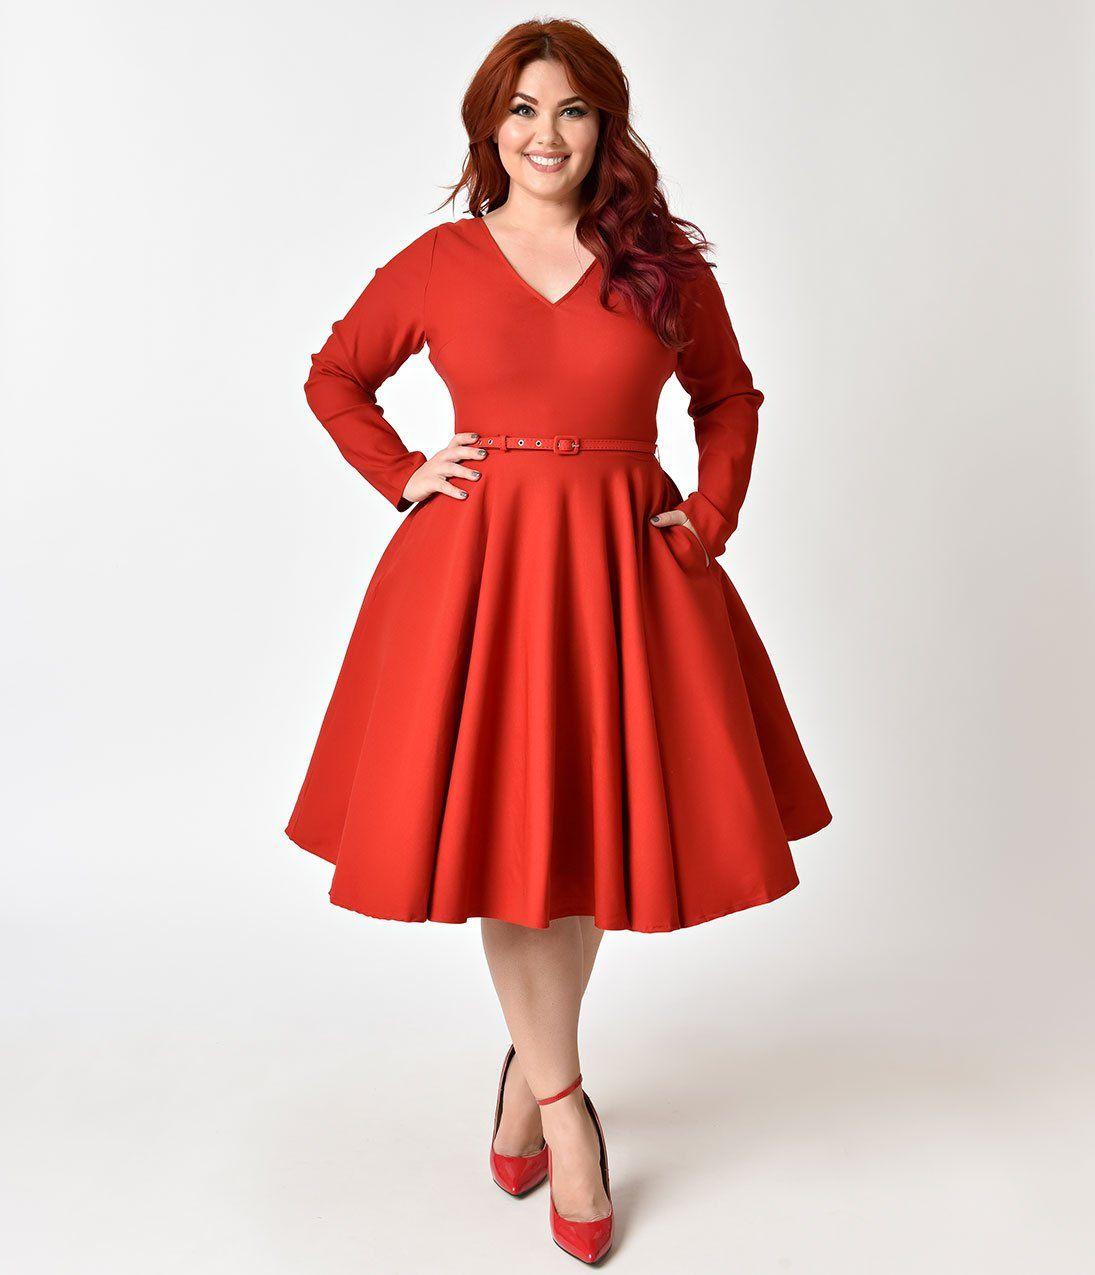 d62d8843c08 1950s Dresses